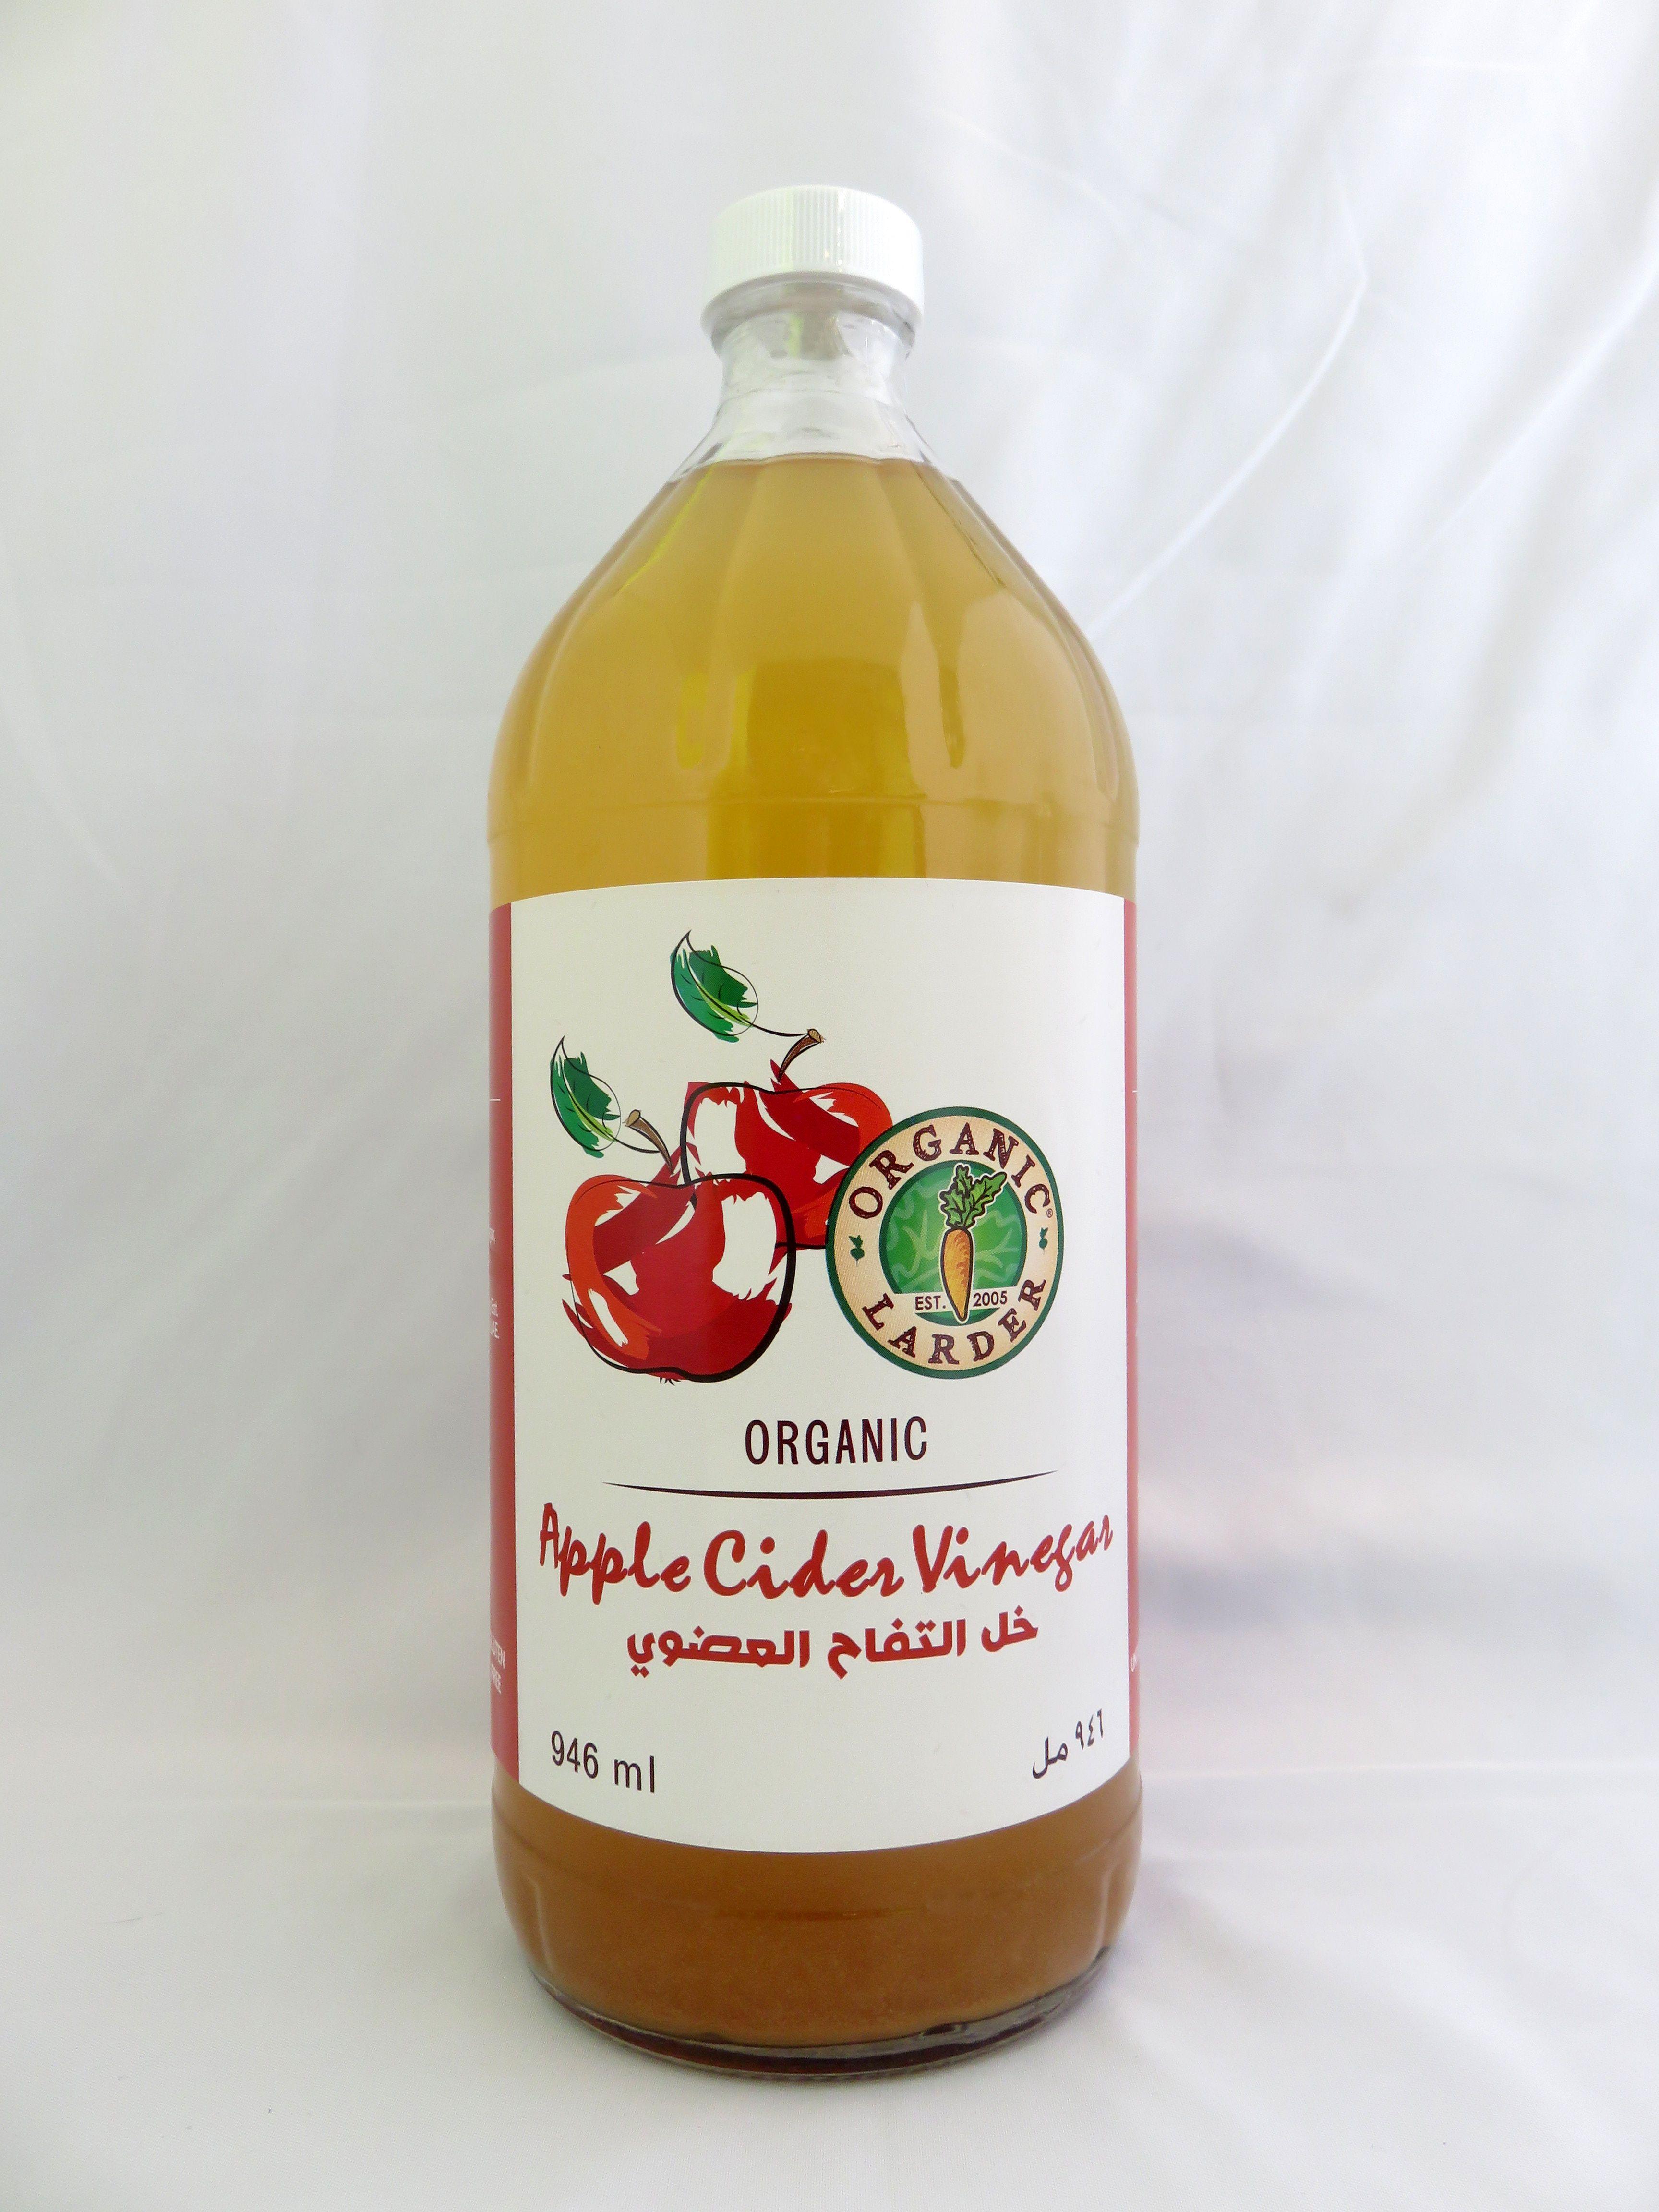 Organic Larder Apple Cider Vinegar Organic Apple Cider Health Promotion Honest Tea Bottle